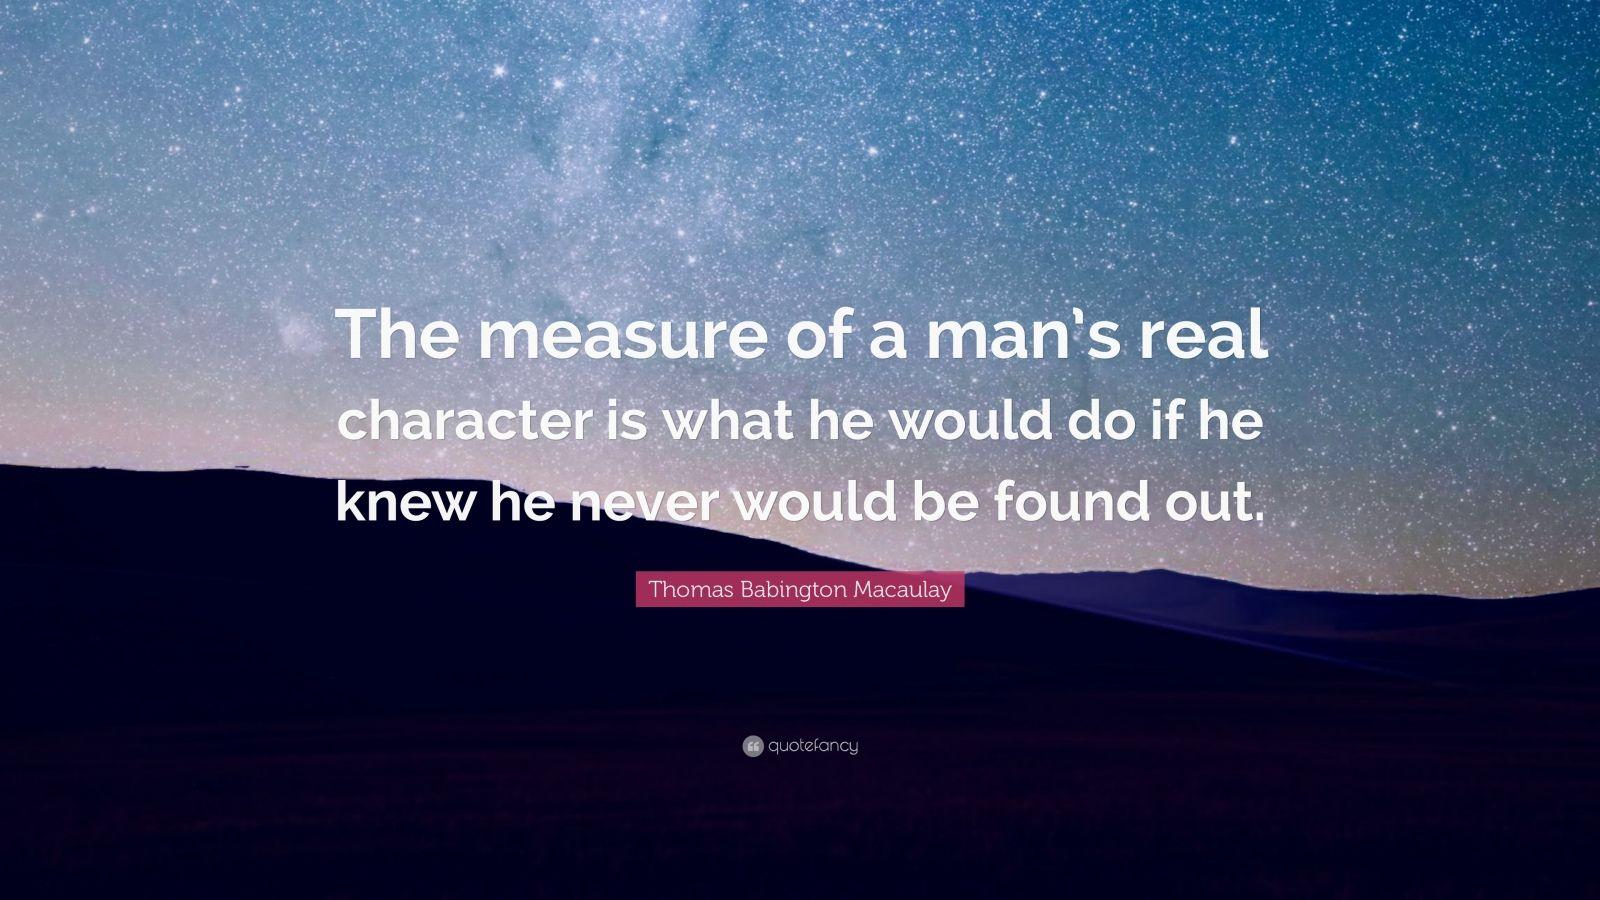 https://quotefancy.com/media/wallpaper/1600x900/58840-Thomas-Babington-Macaulay-Quote-The-measure-of-a-man-s-real.jpg